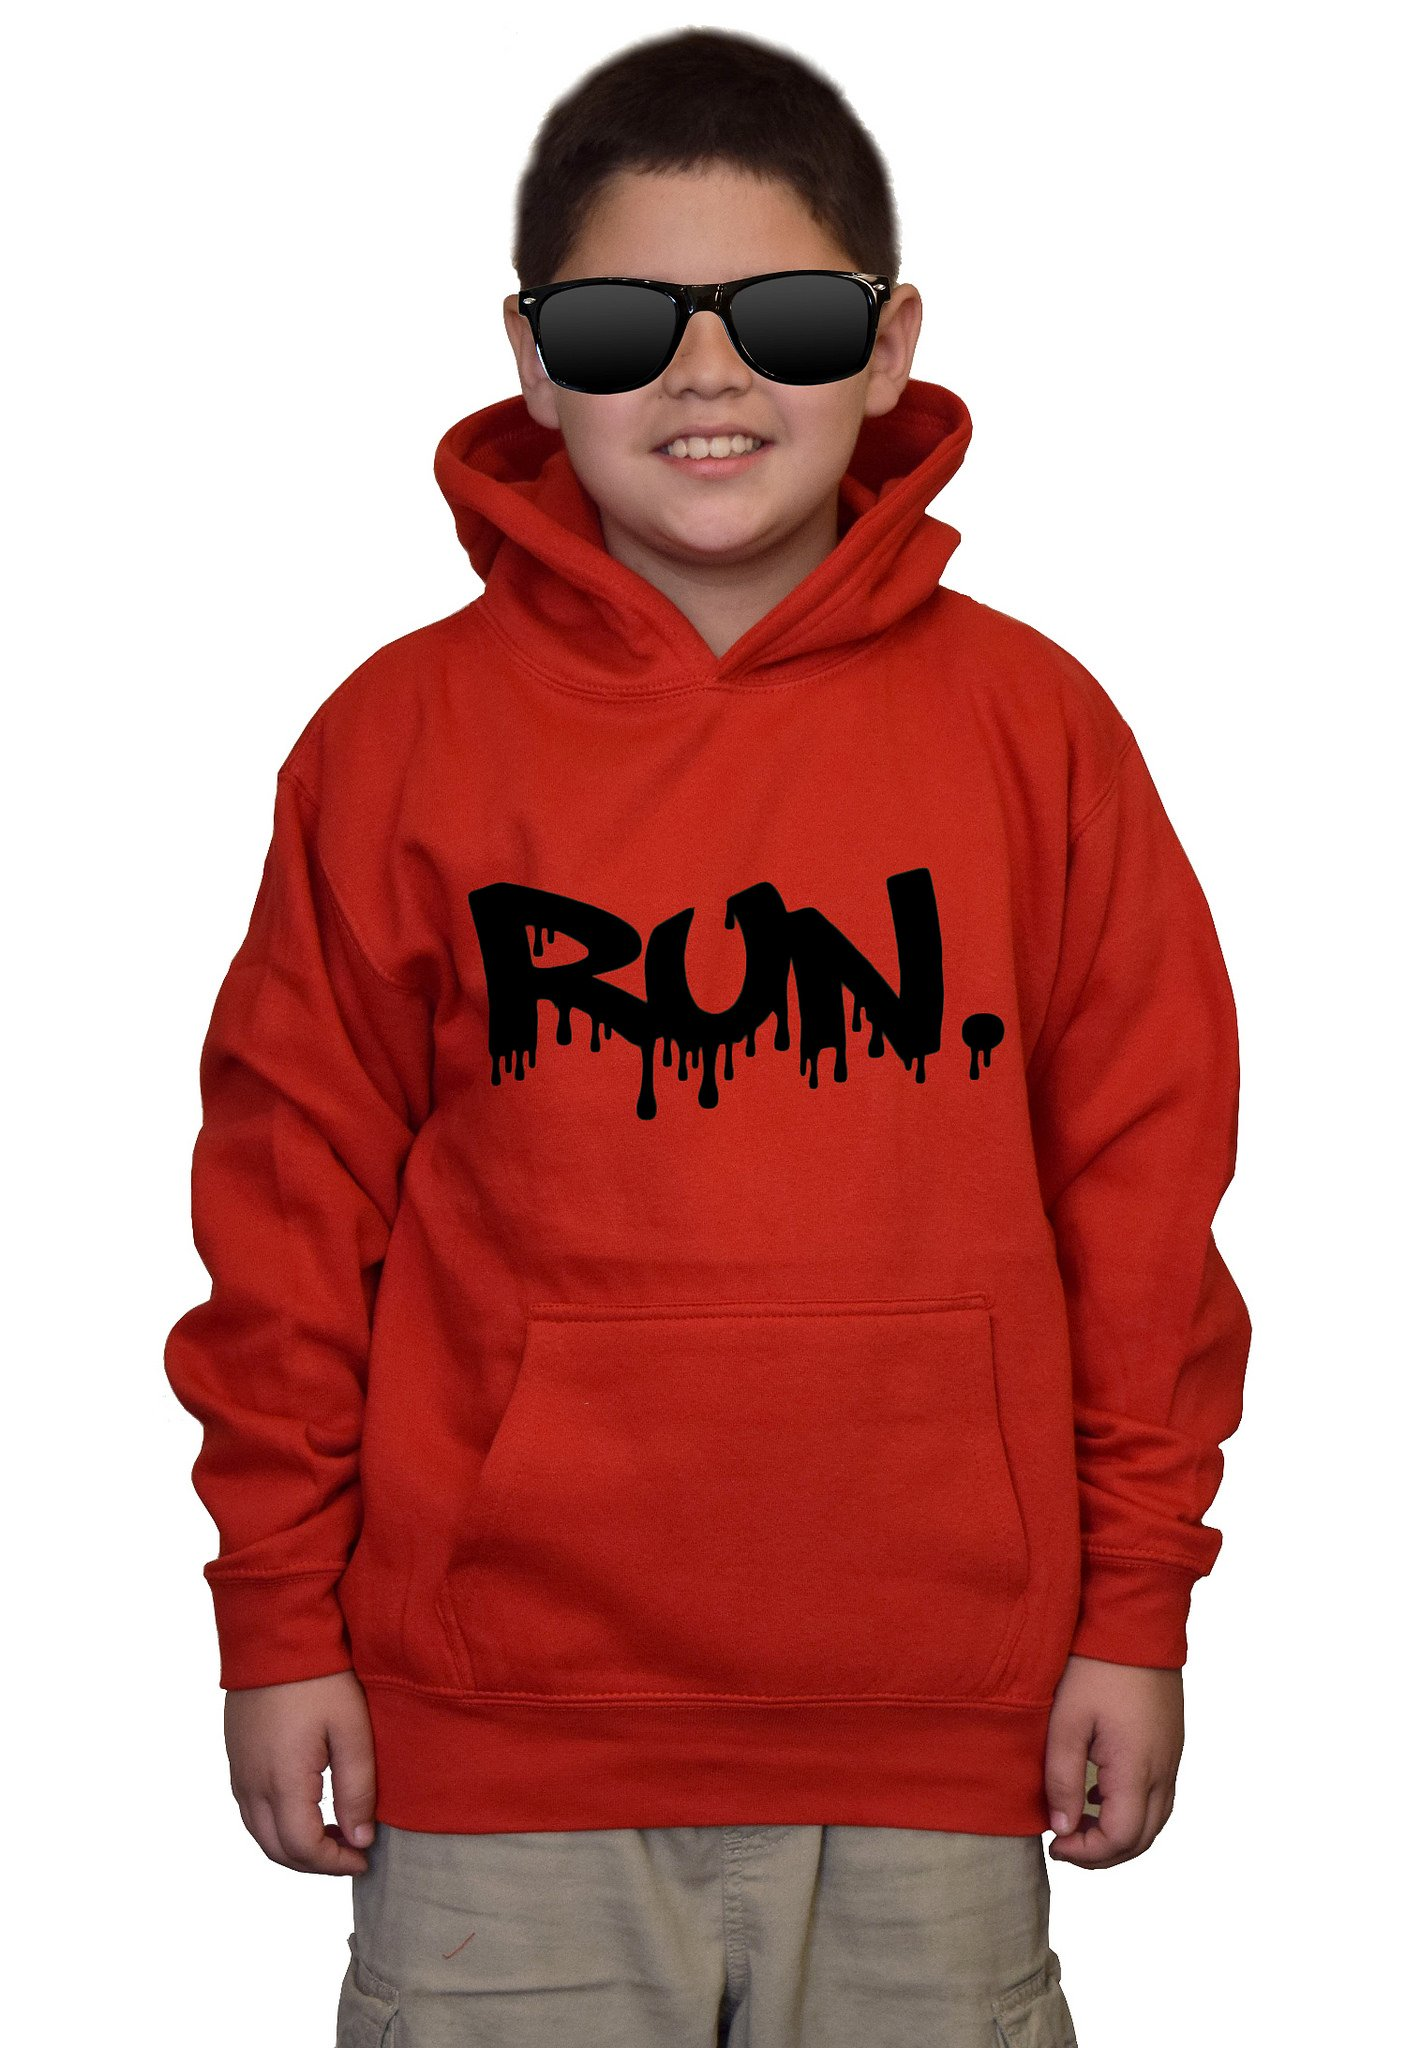 Youth Dripping Run V436 Red kids Sweatshirt Hoodie Small